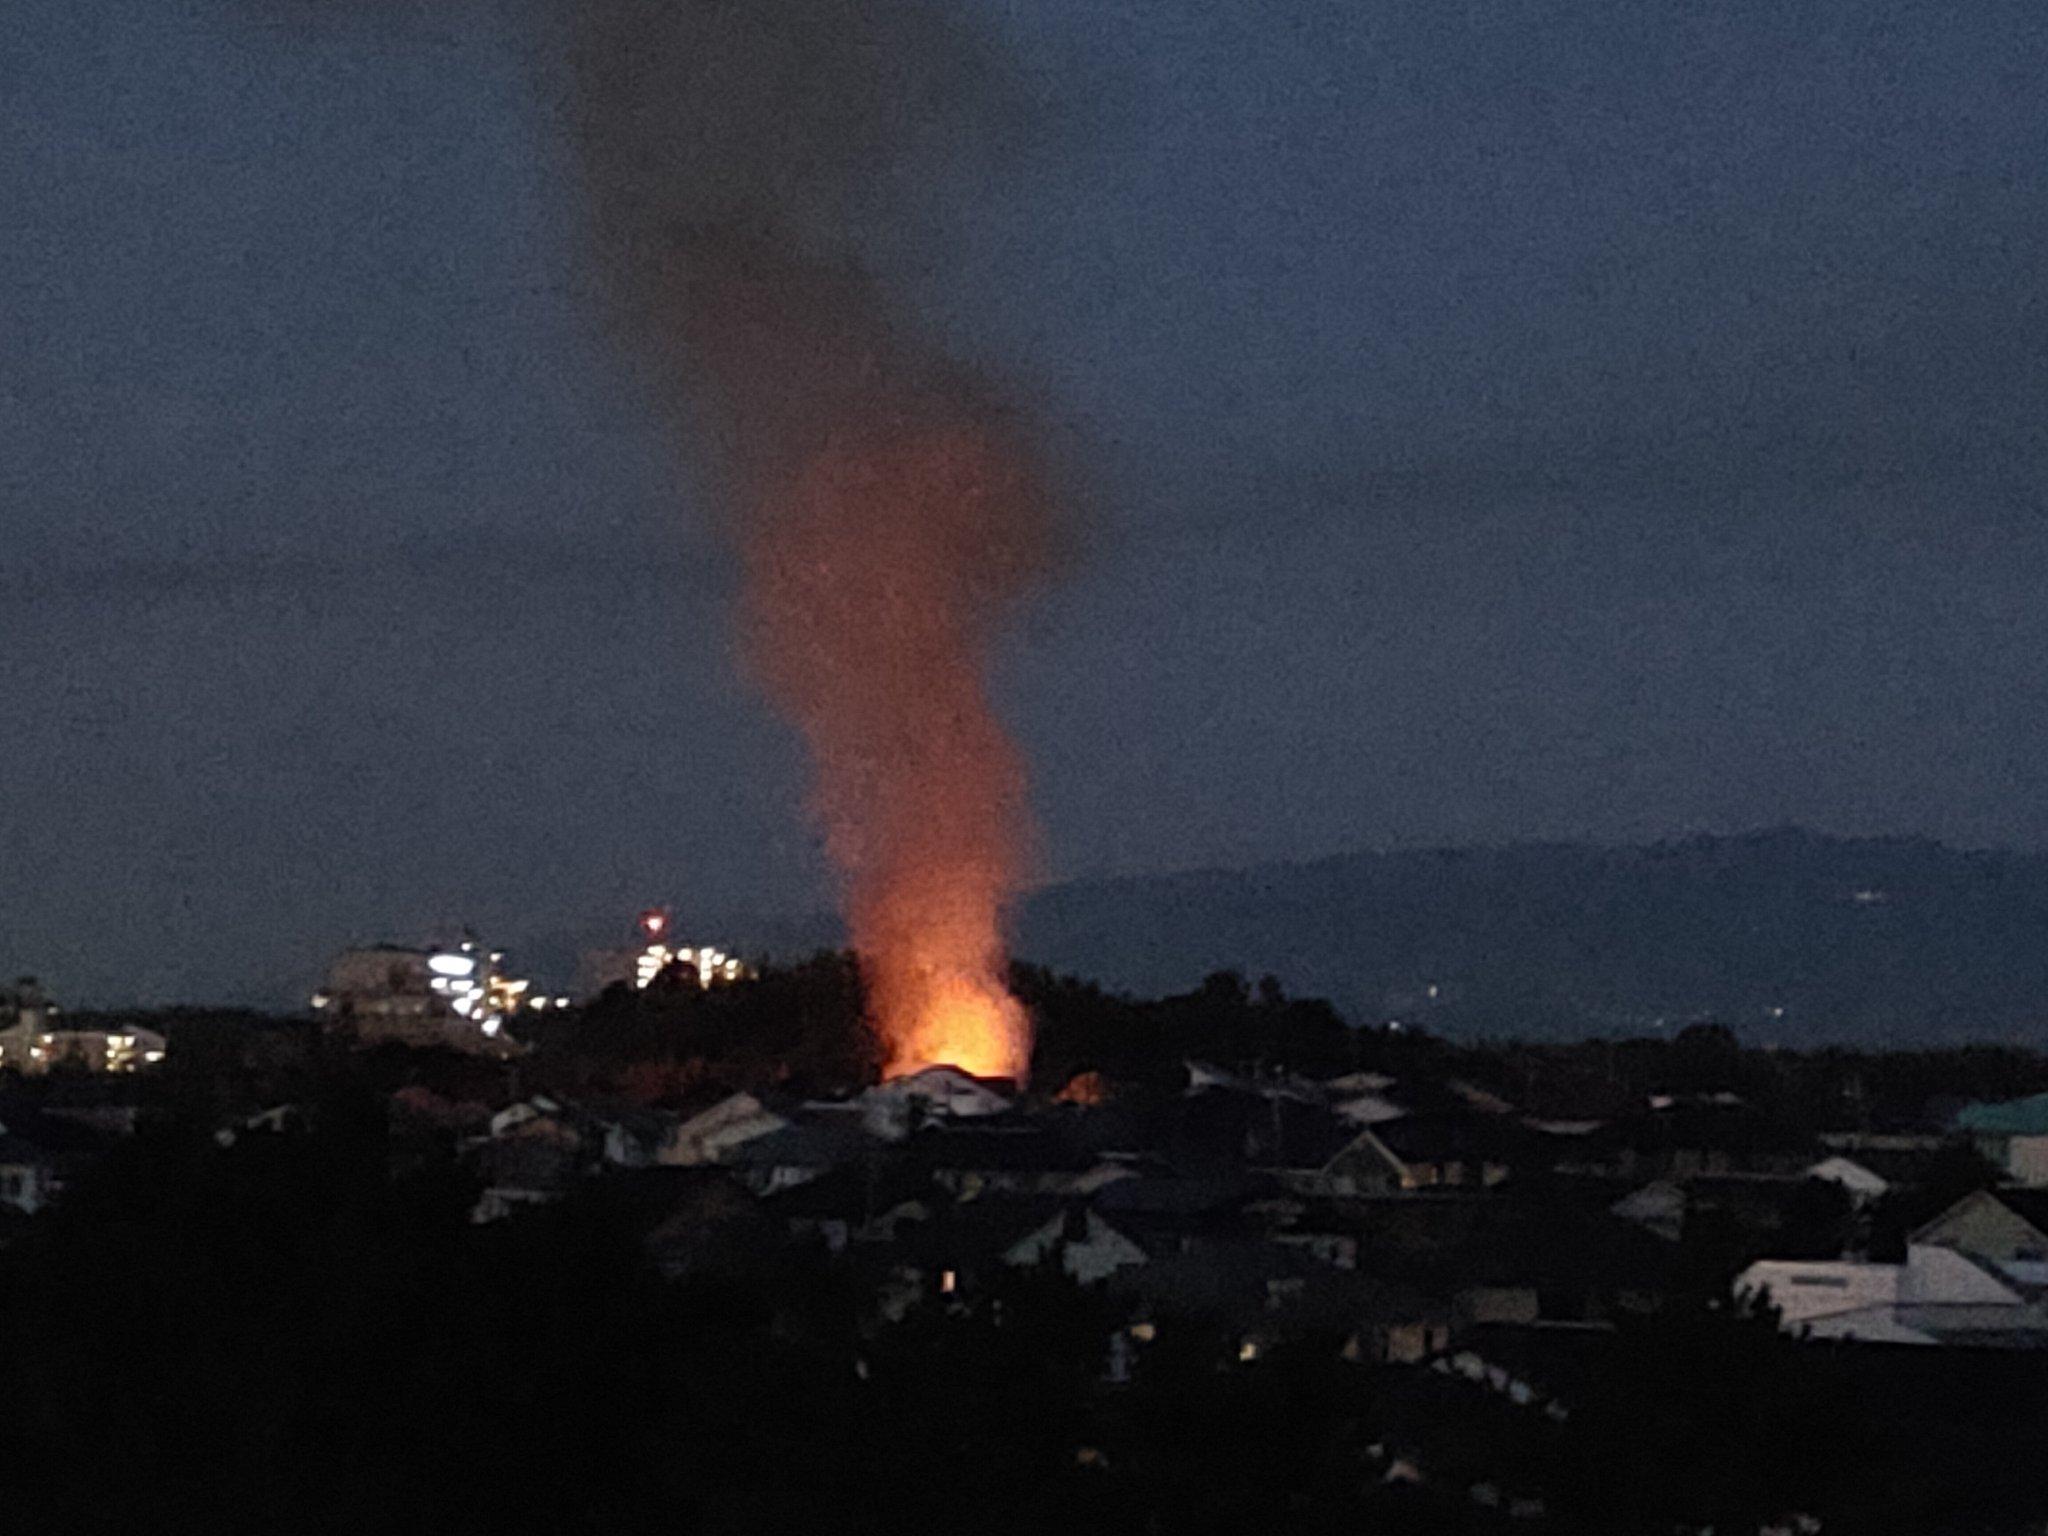 画像,桃山台で火事  #桃山台 #火事 https://t.co/oM7RcDLQpY。